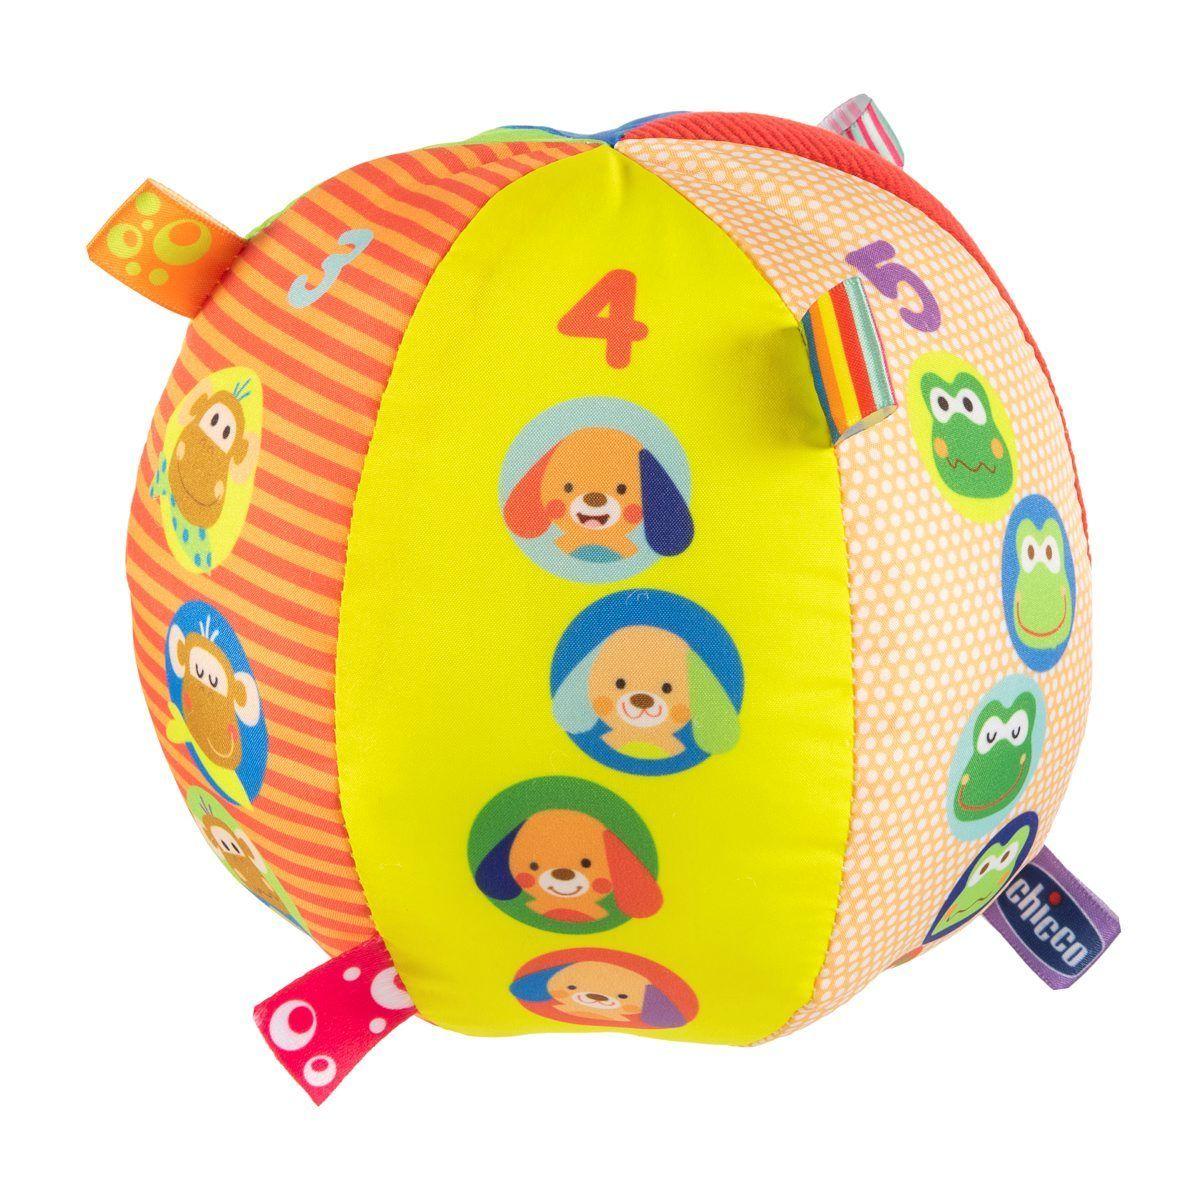 Игрушка Chicco Музыкальный мячик 3м+